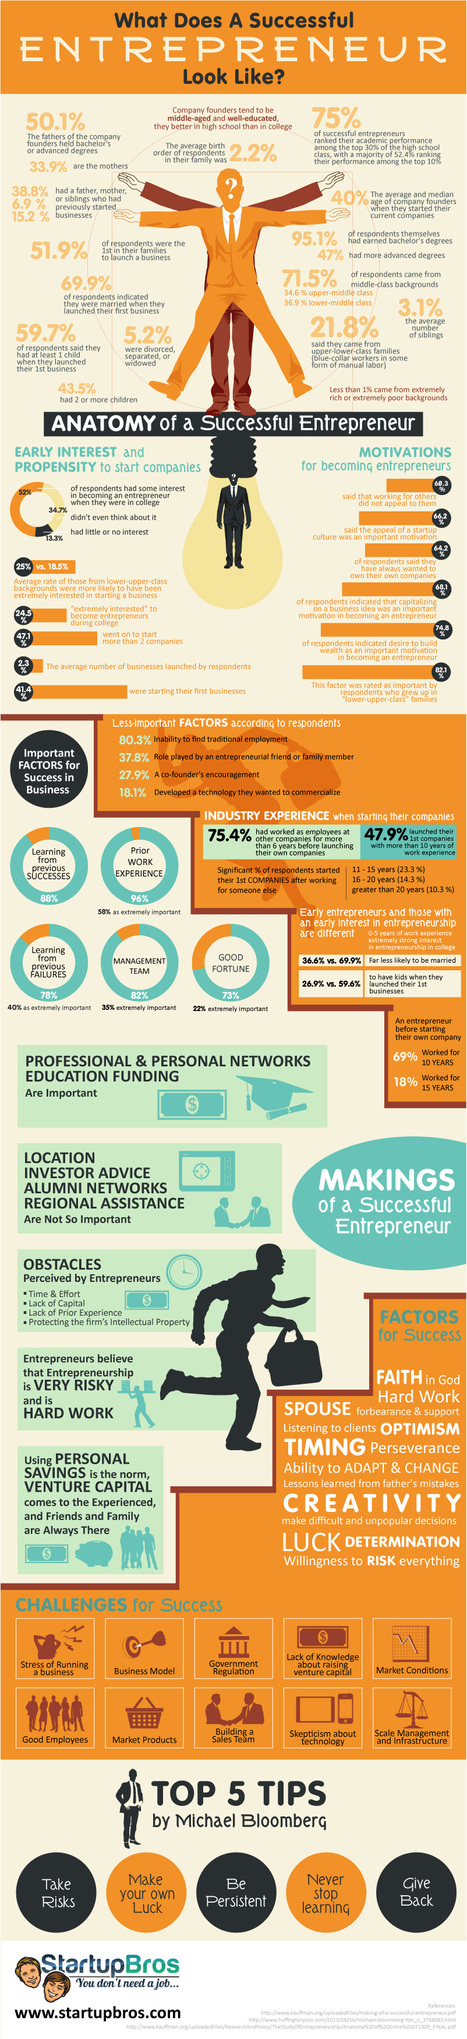 What-Makes-A-Successful-Entrepreneur-Infographic_mini.jpg (802x3501 pixels) | Empowered Entrepreneur | Scoop.it